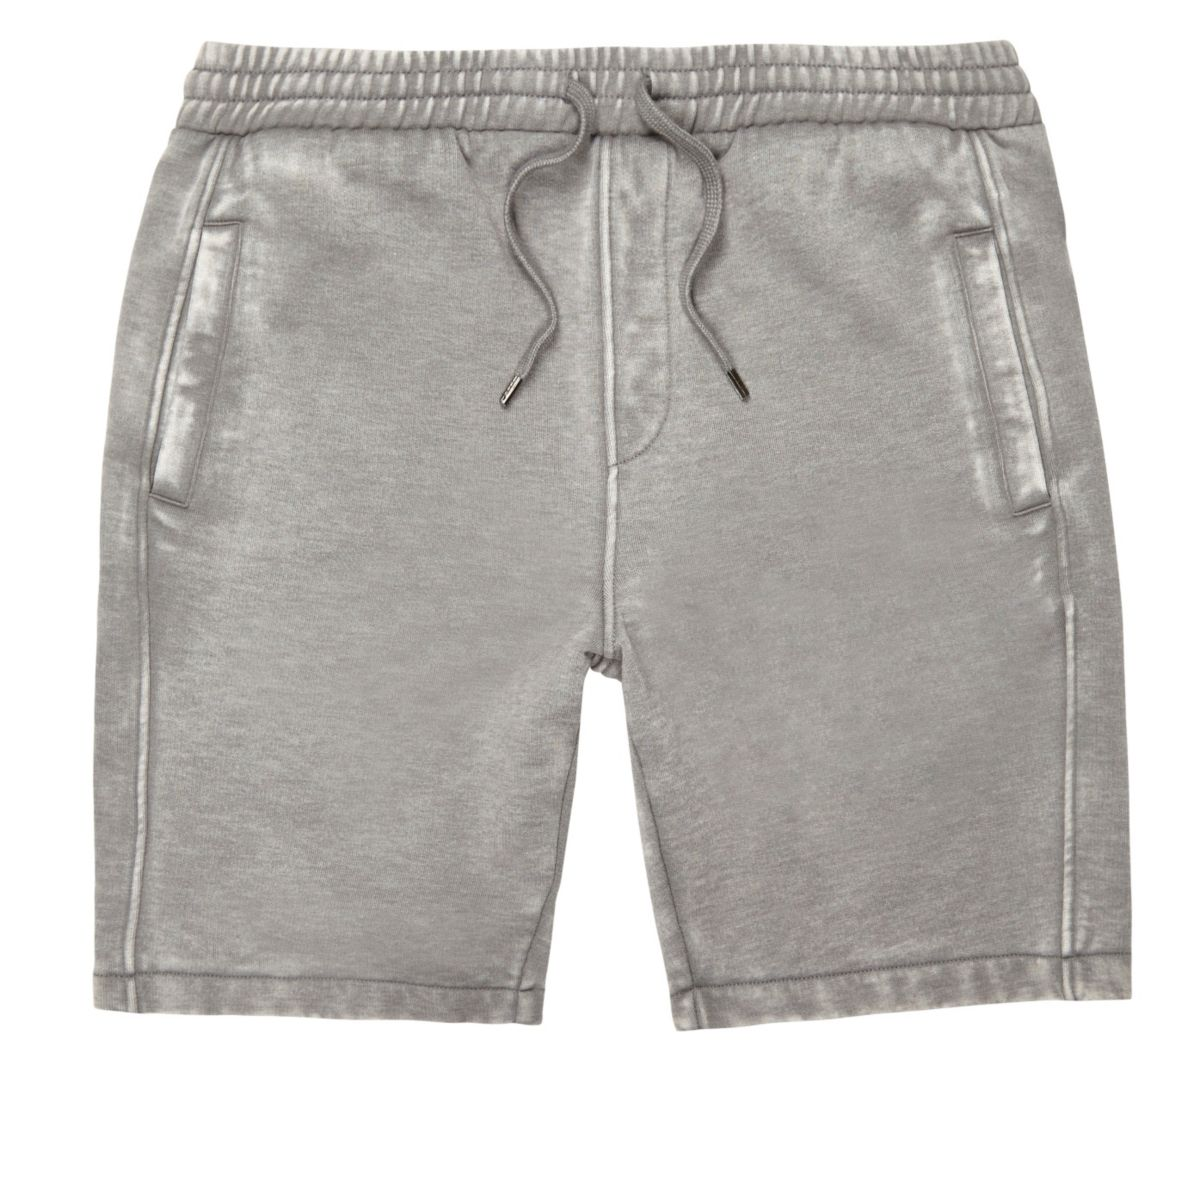 Grey burnout casual shorts